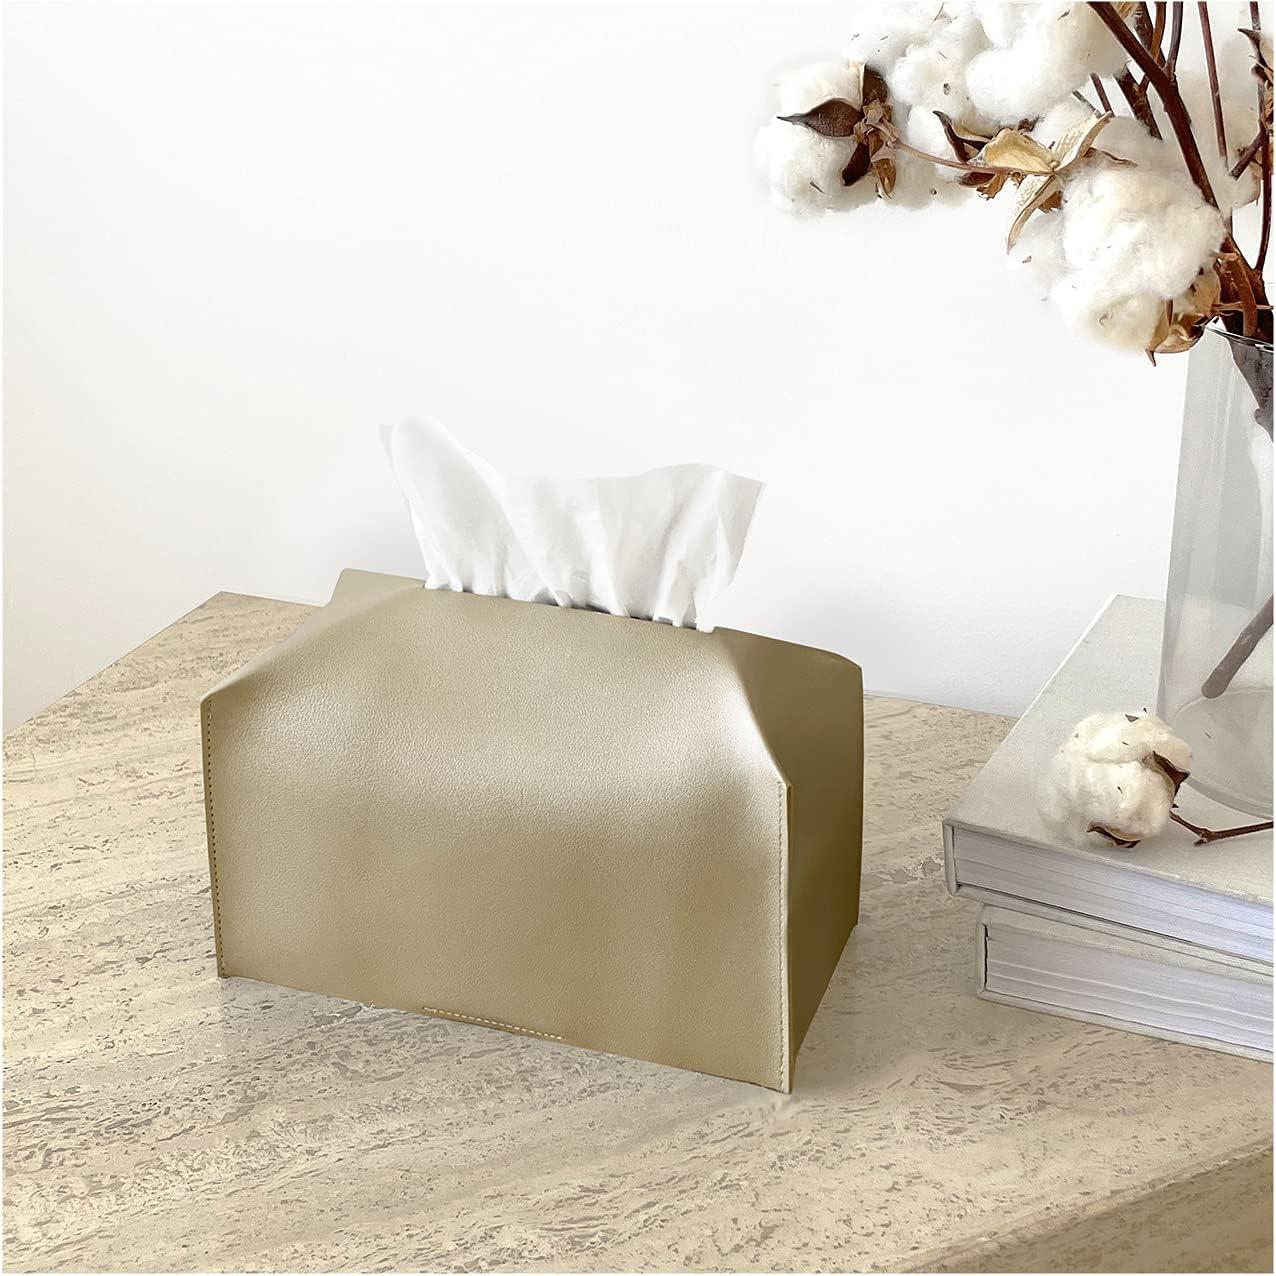 Birdy Co. Luxury Gold Tissue High order Box - Rectangular Holder Cover